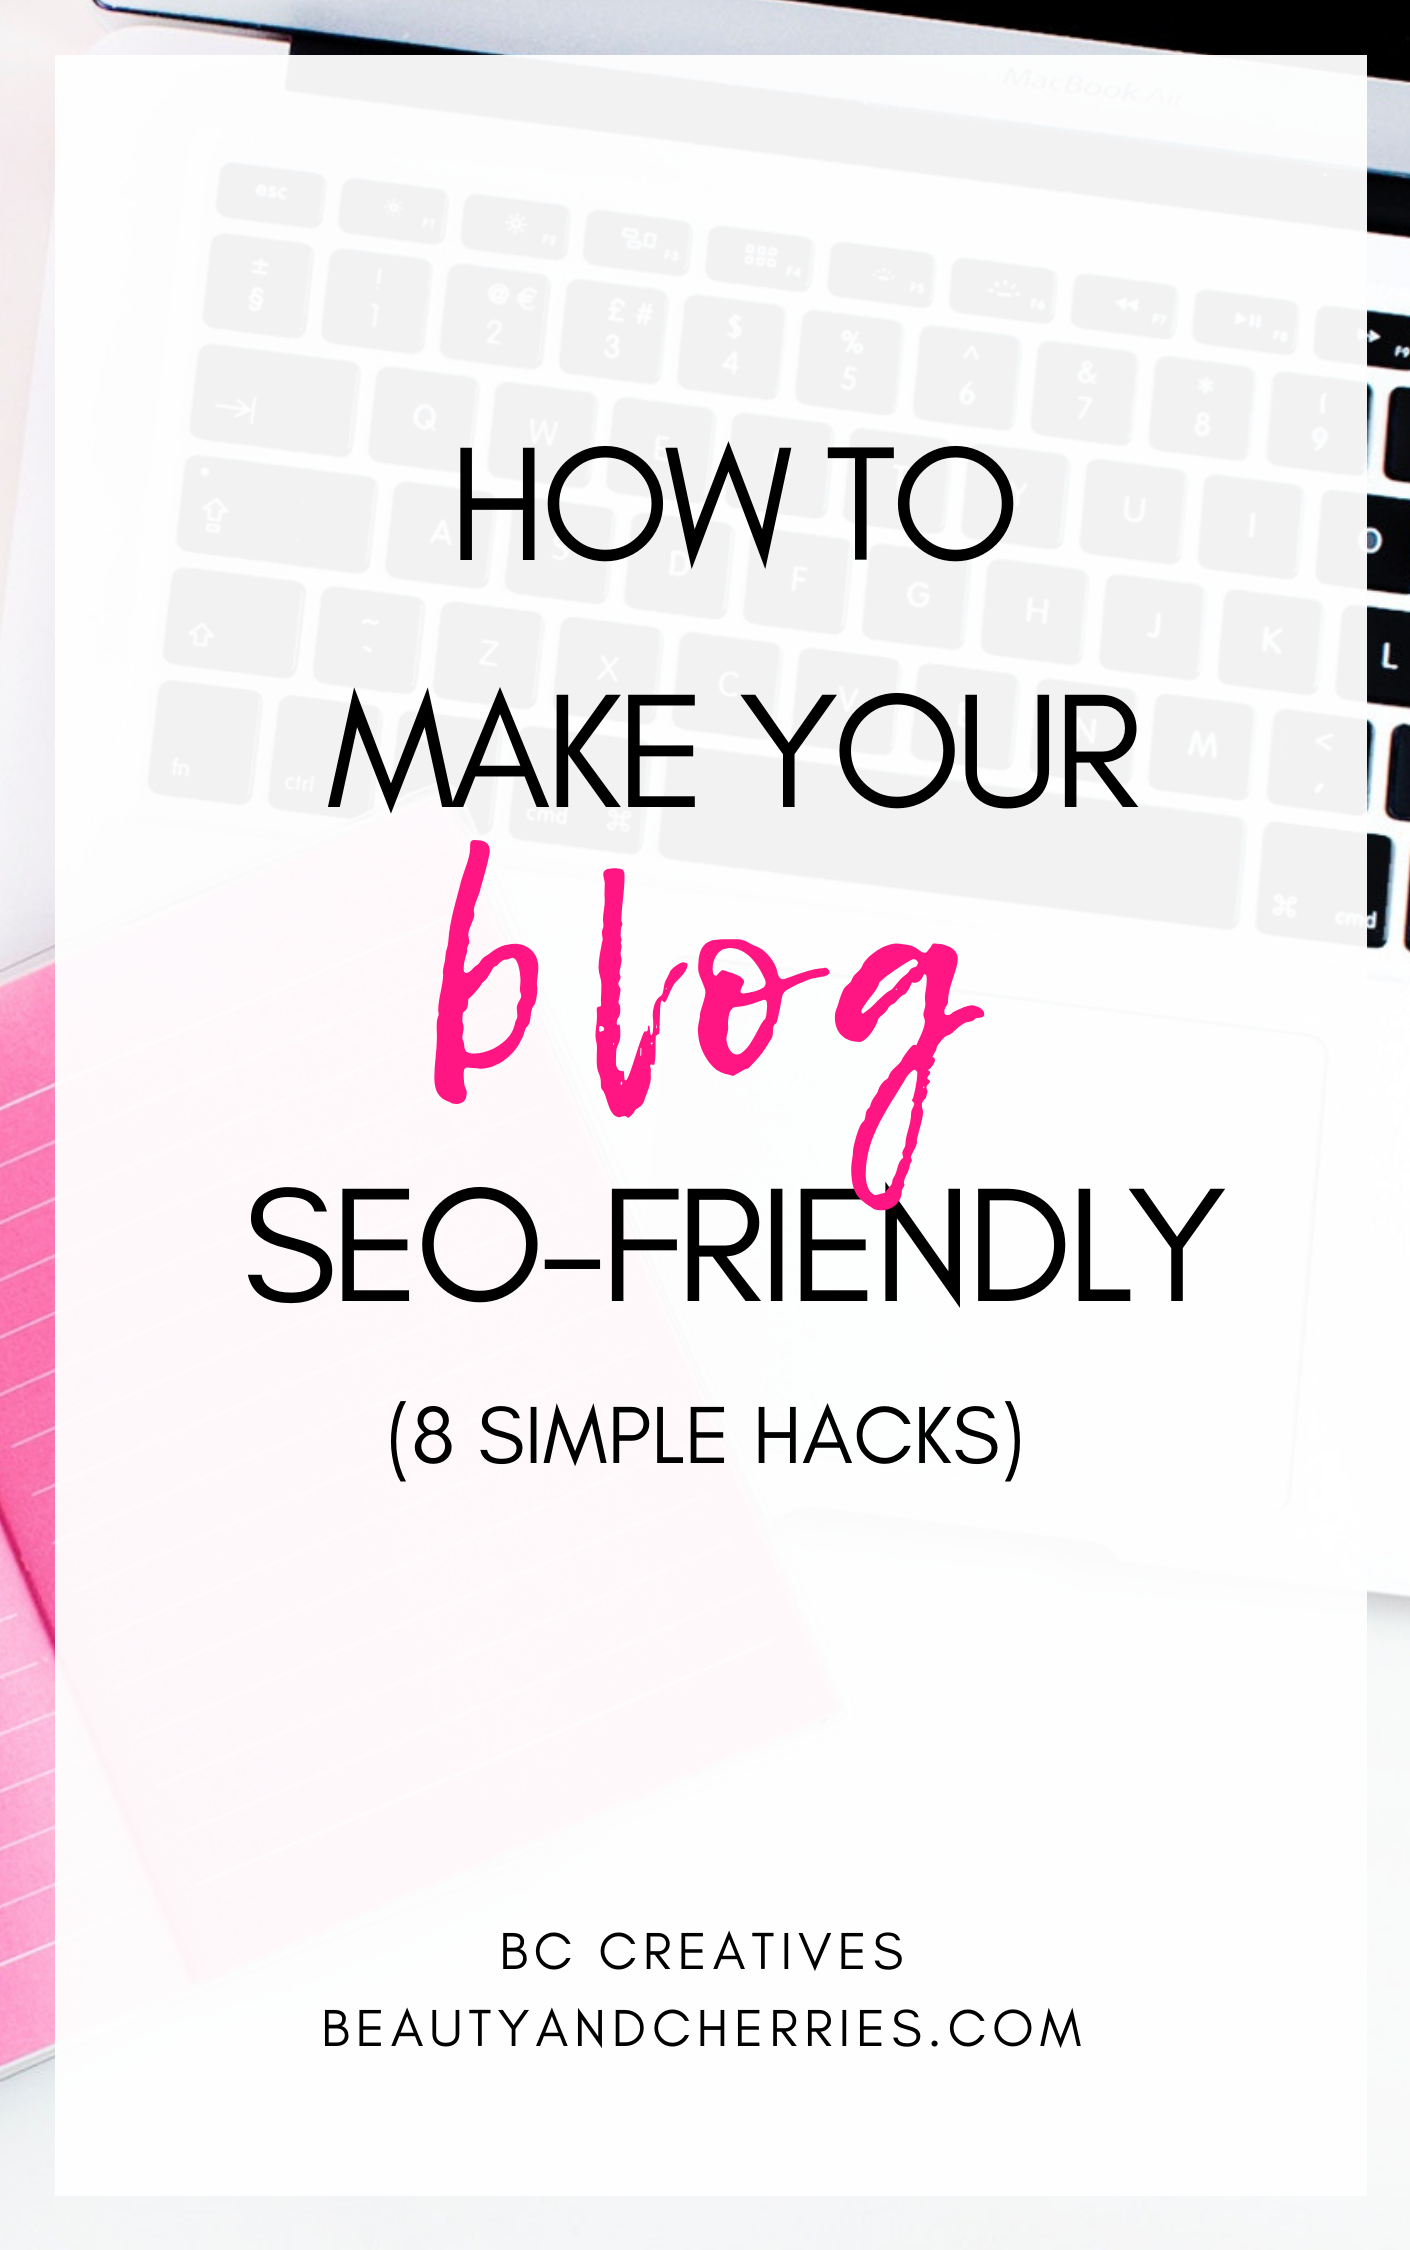 8 SEO Tips Boost Your Blog's Organic Traffic - BC Creatives